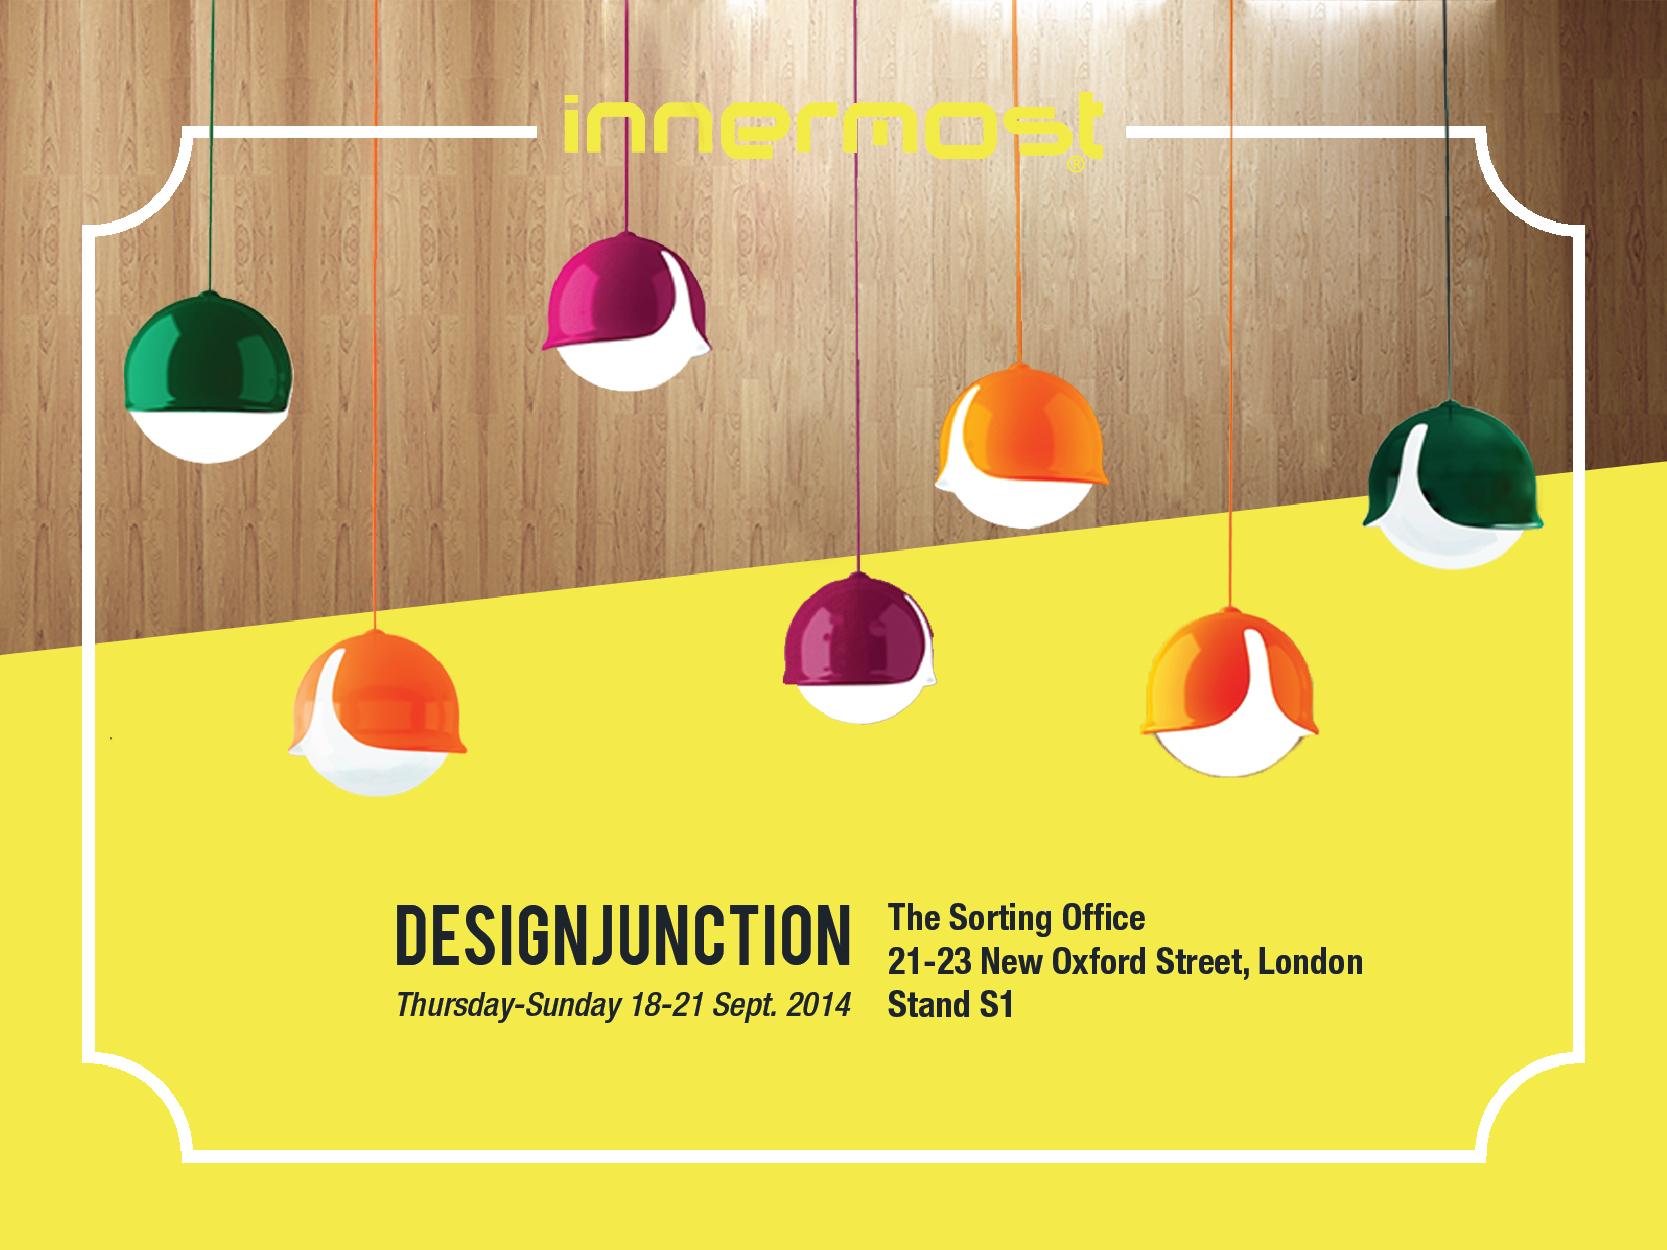 Design Junction